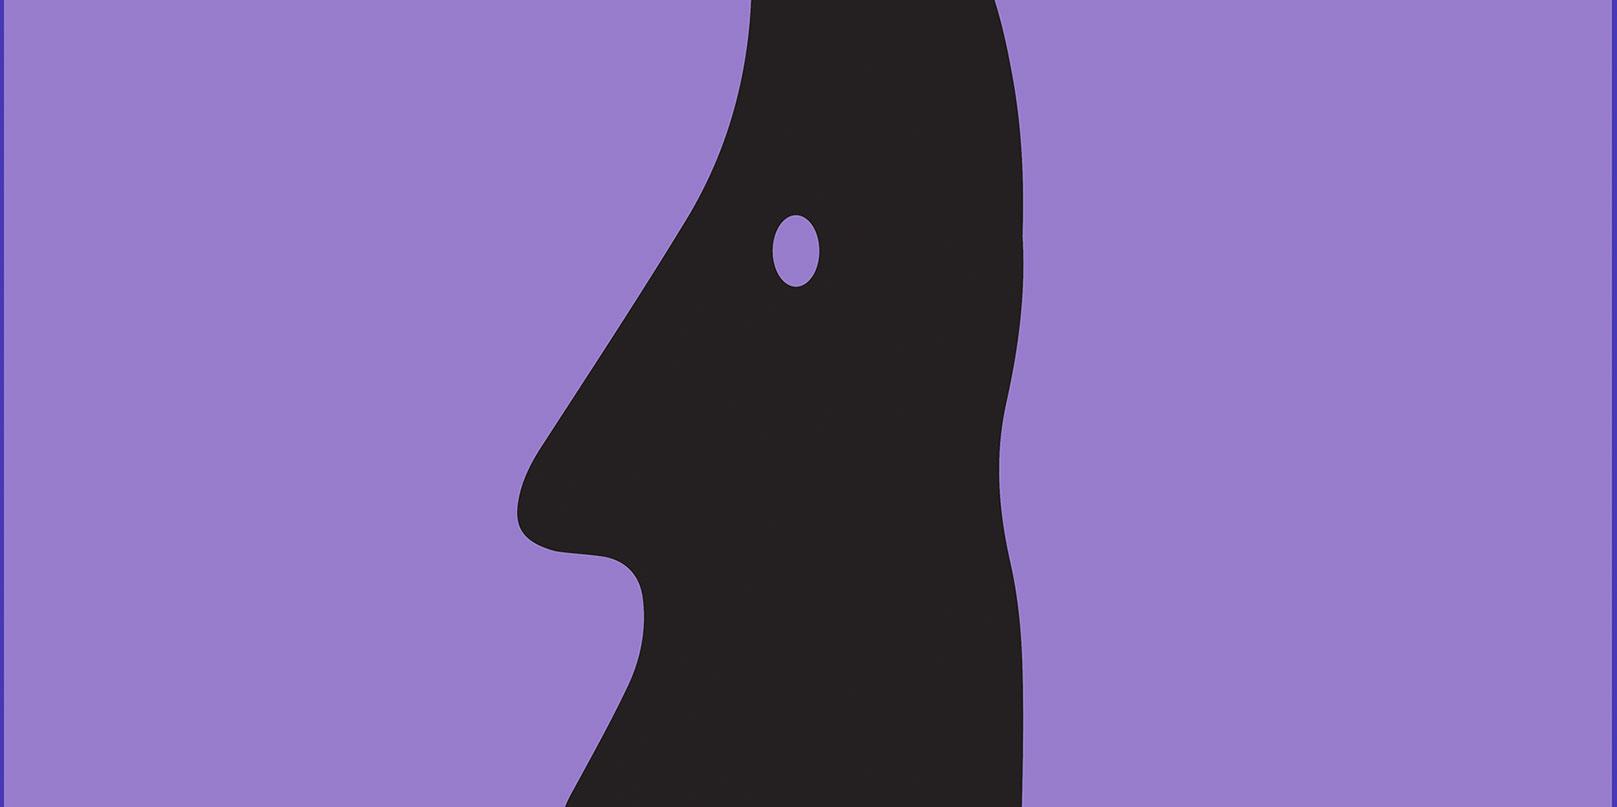 Charles Simic, Poet | Ceb Design